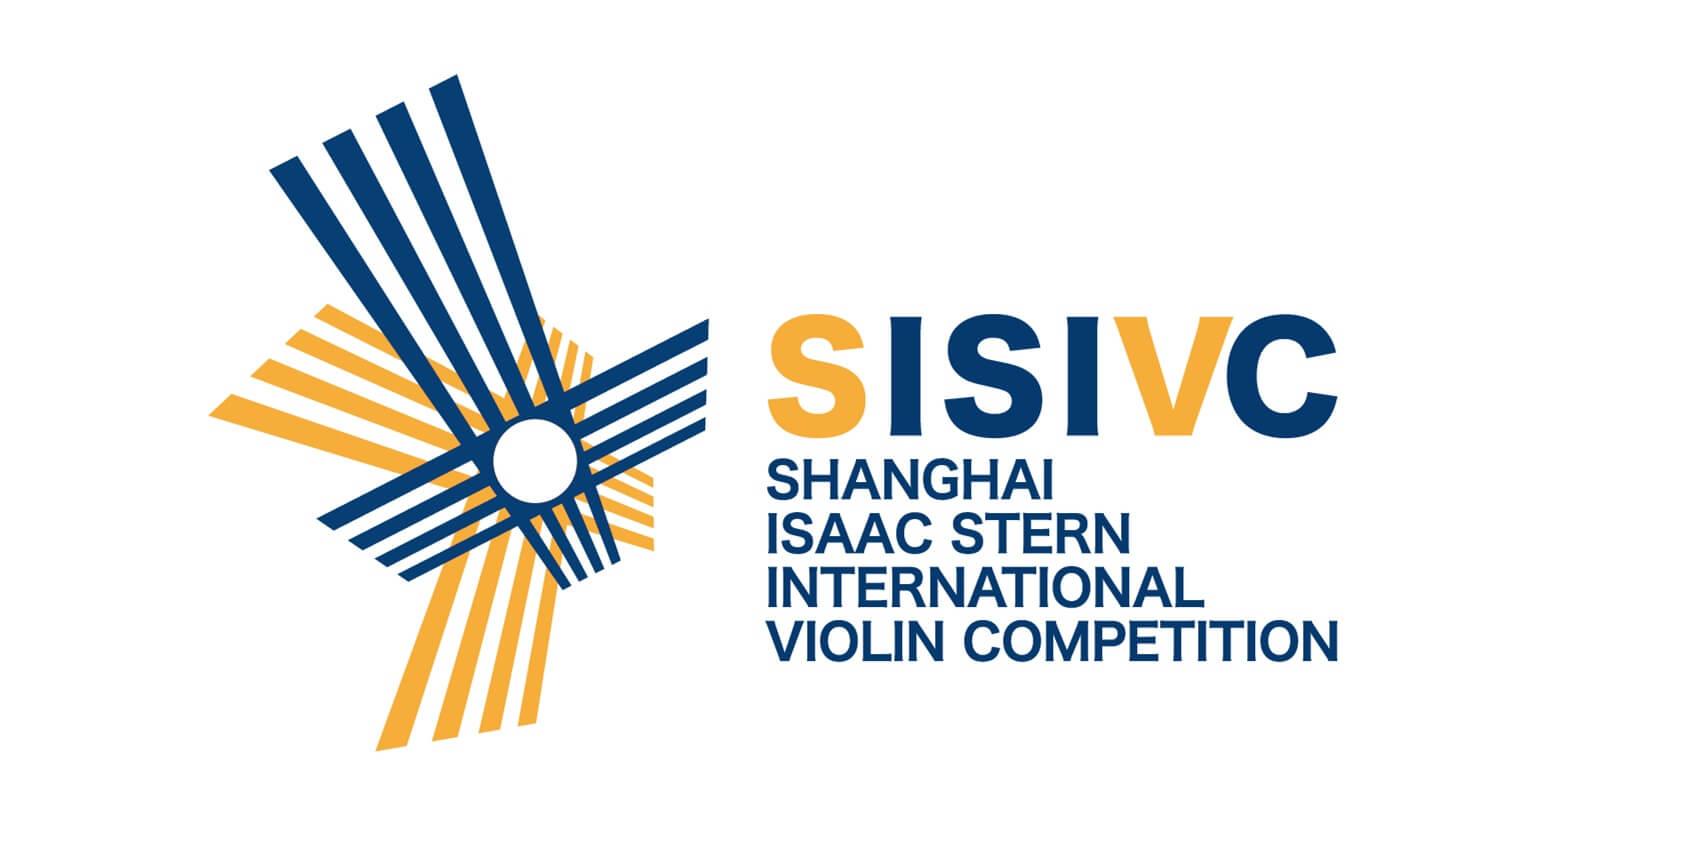 SISIVC_Shanghai_Isaac_Stern_International_Violin_Compoetition